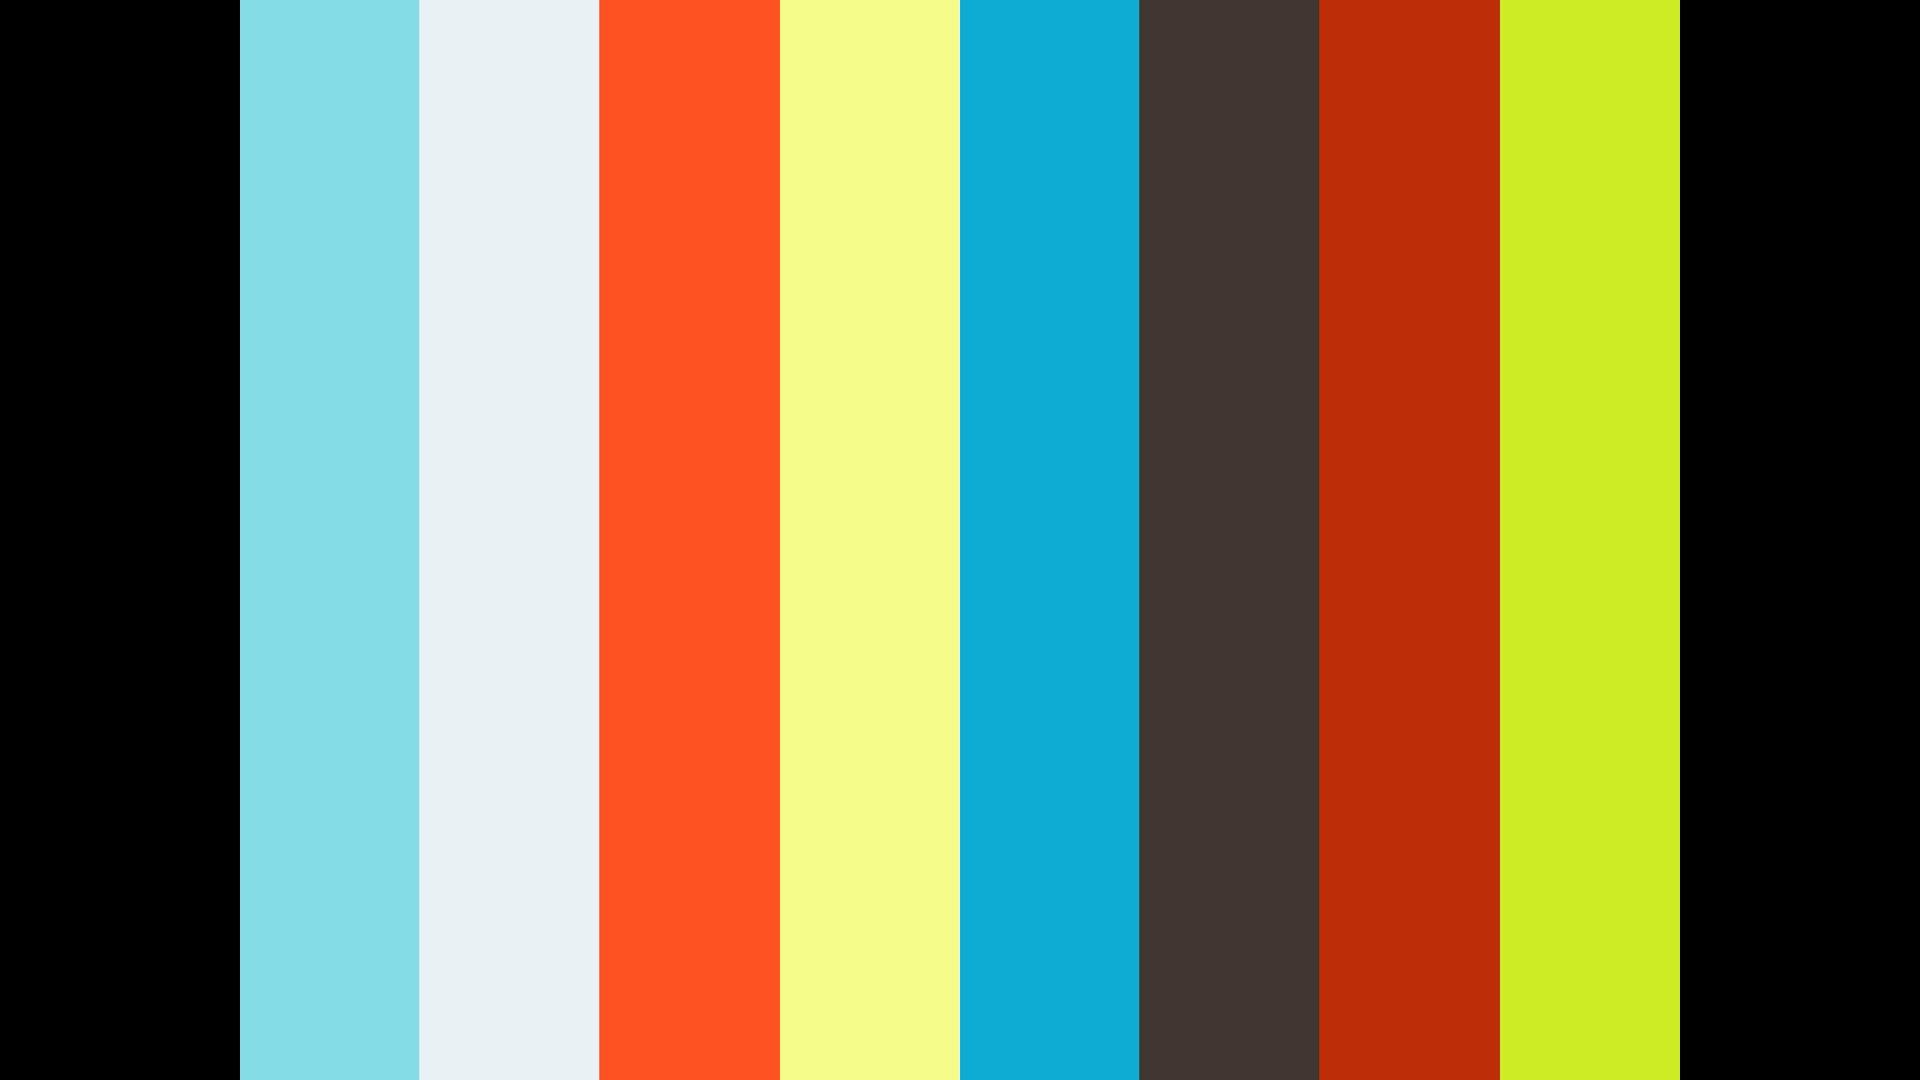 LIVE 9 MARS - ZUMBA - MYRIAM